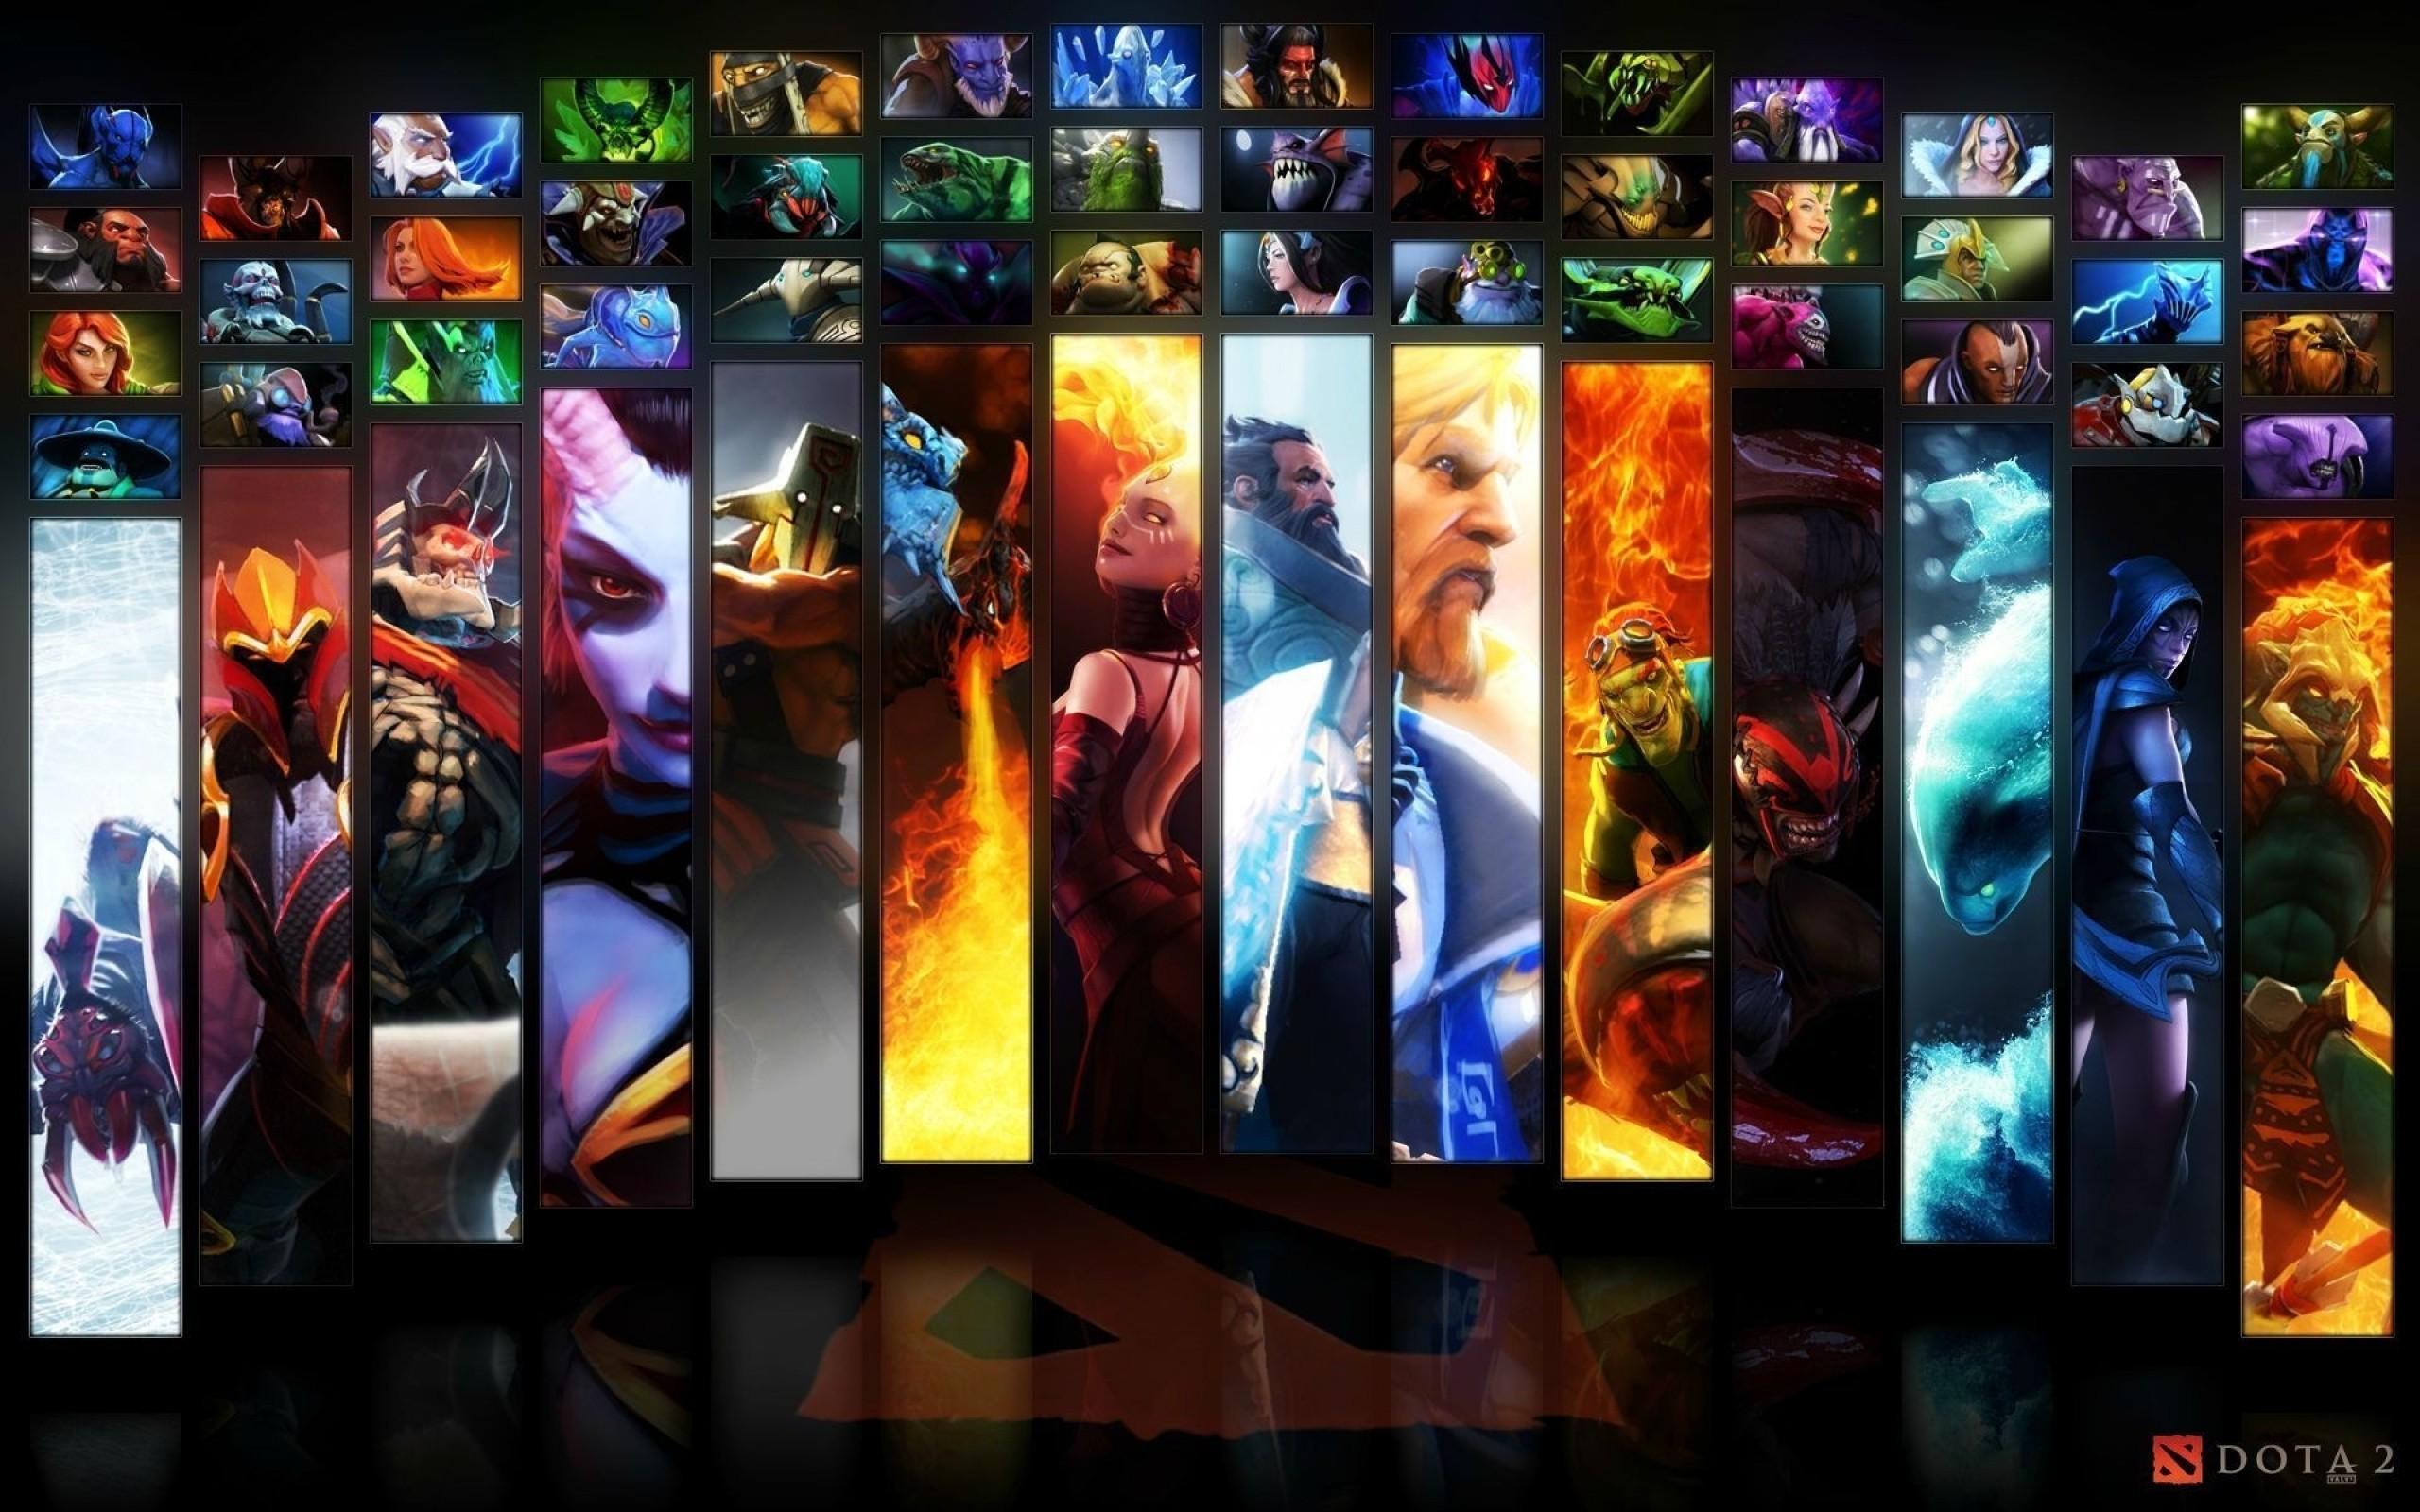 gaming wallpaper 1680x1050 - photo #22